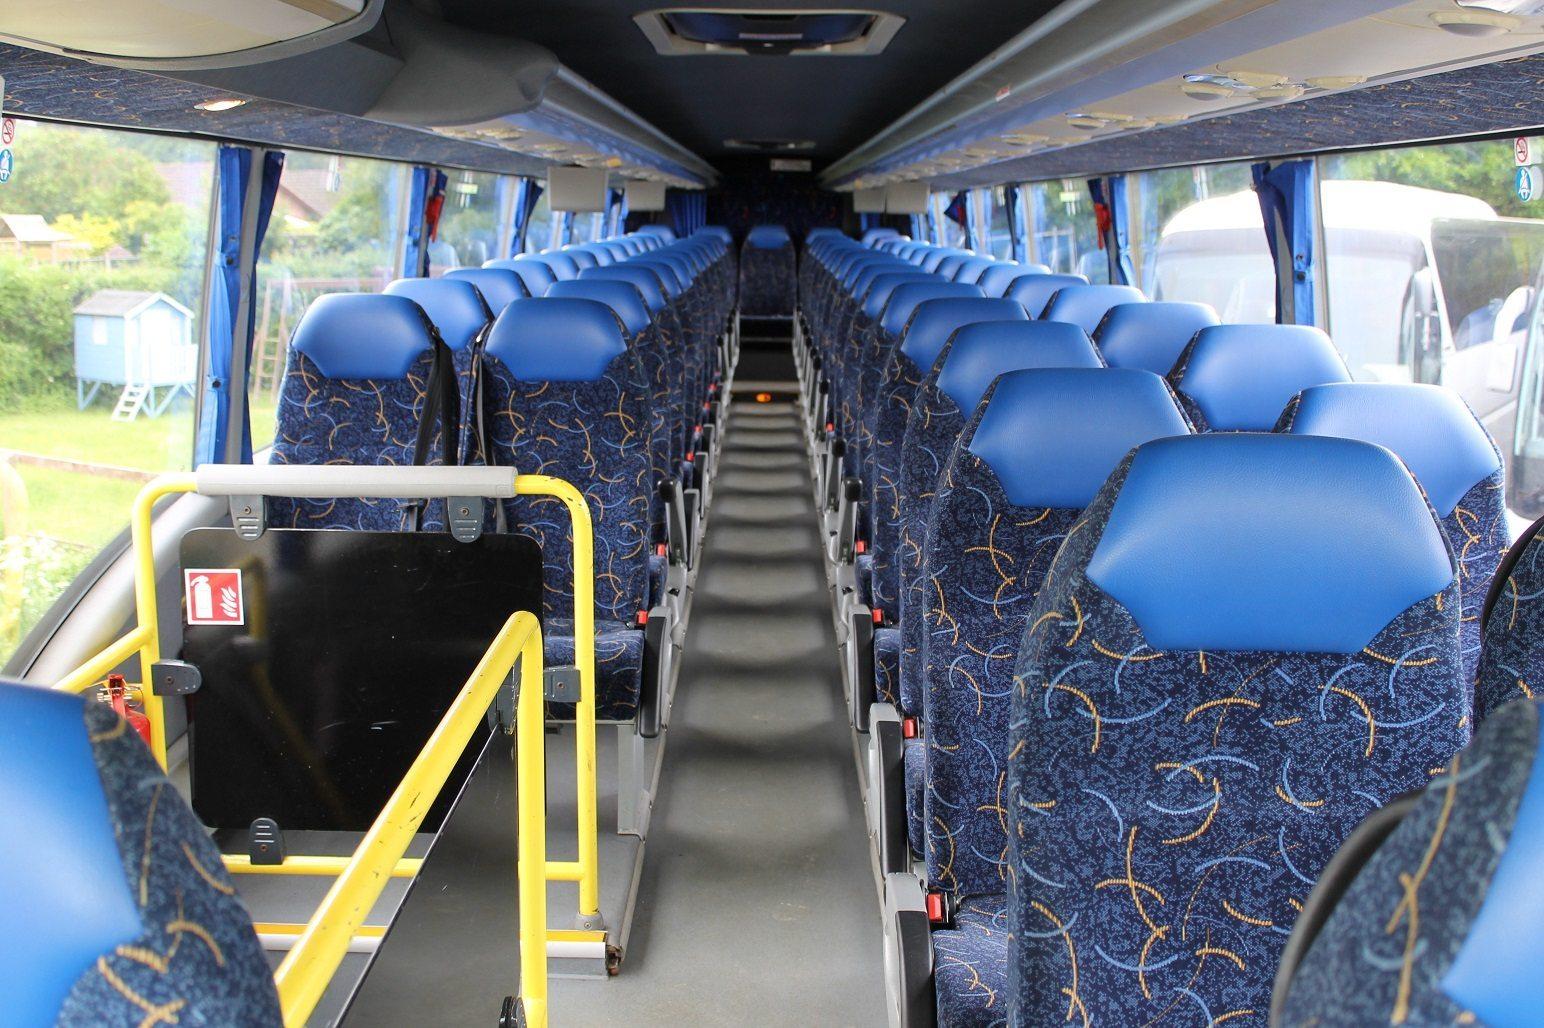 07 AYATS BRAVO 1 DOUBLE DECK 81 SEAT - Hills Coaches